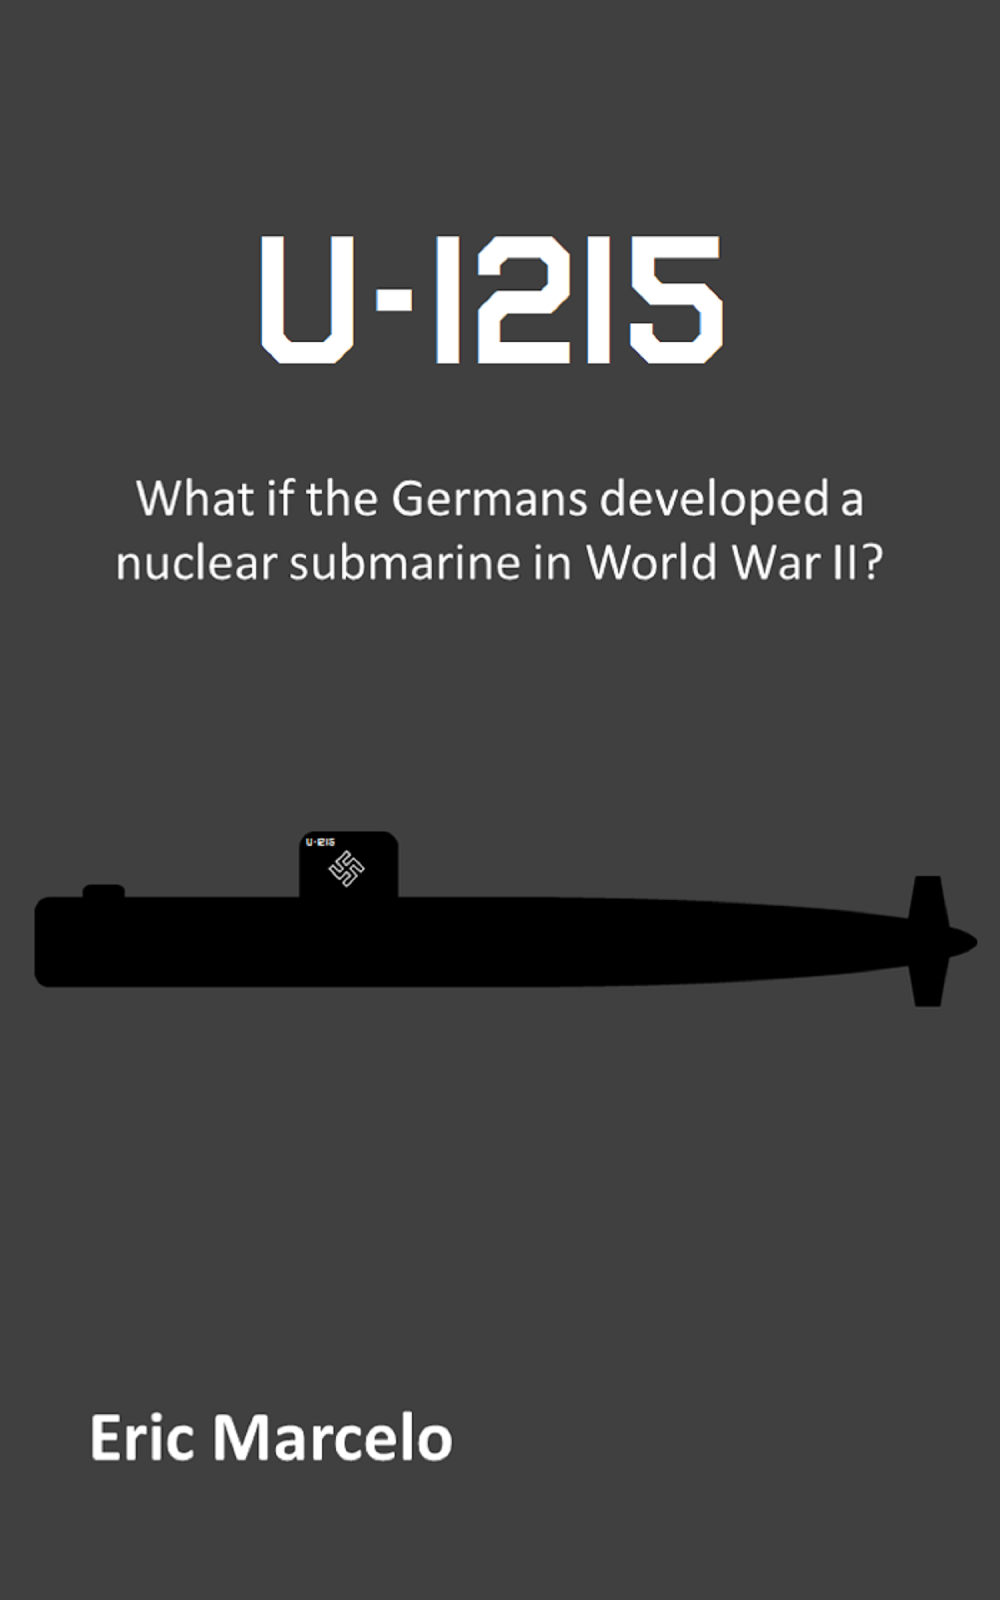 U-1215